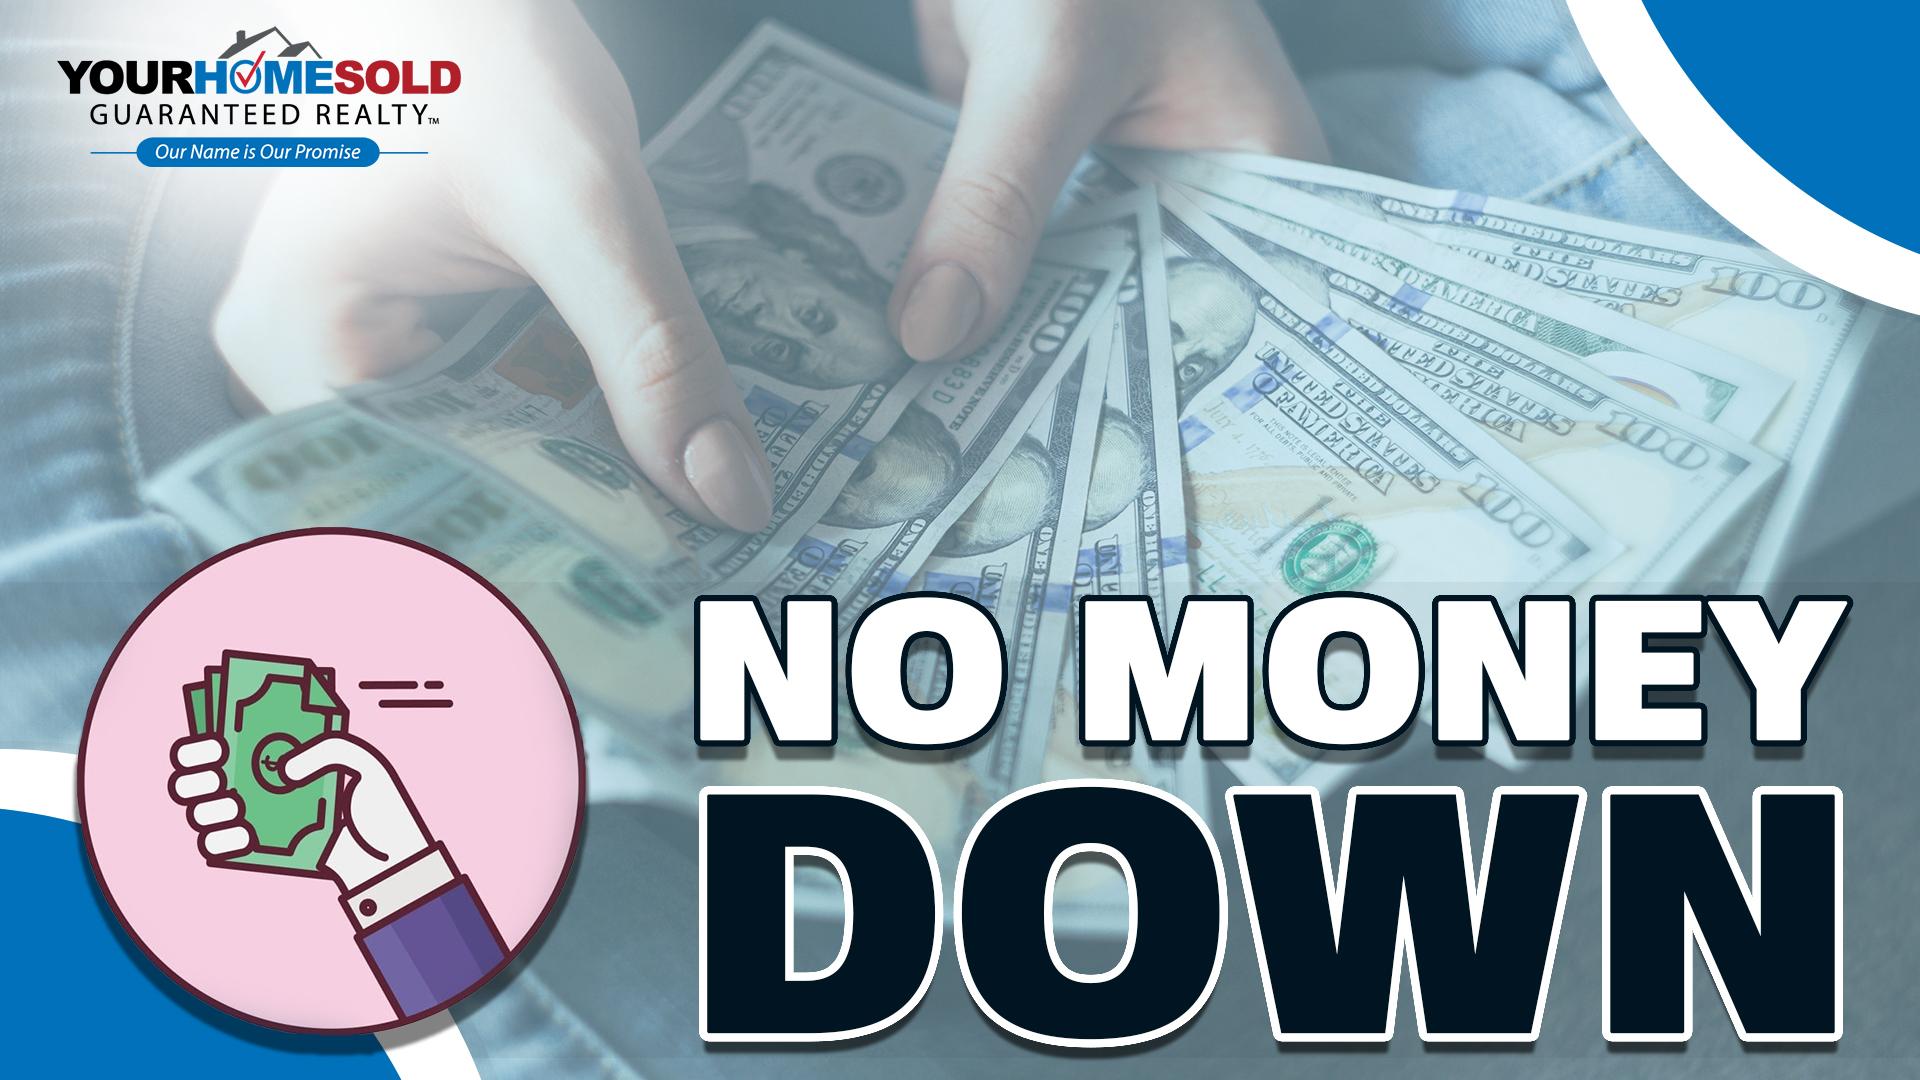 No money down 2.jpg